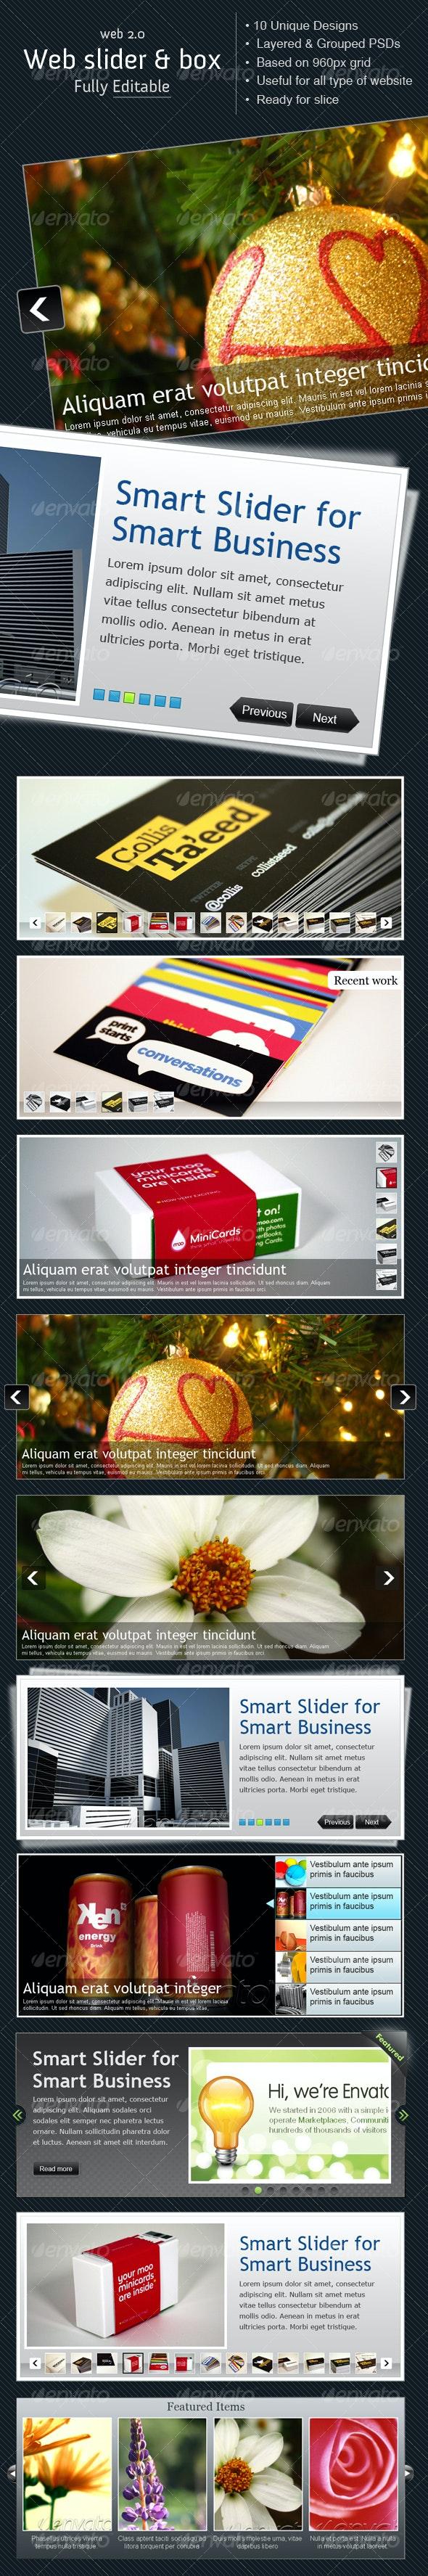 Ultimate Web Slider & Box 0 Vol.1 - Web Elements